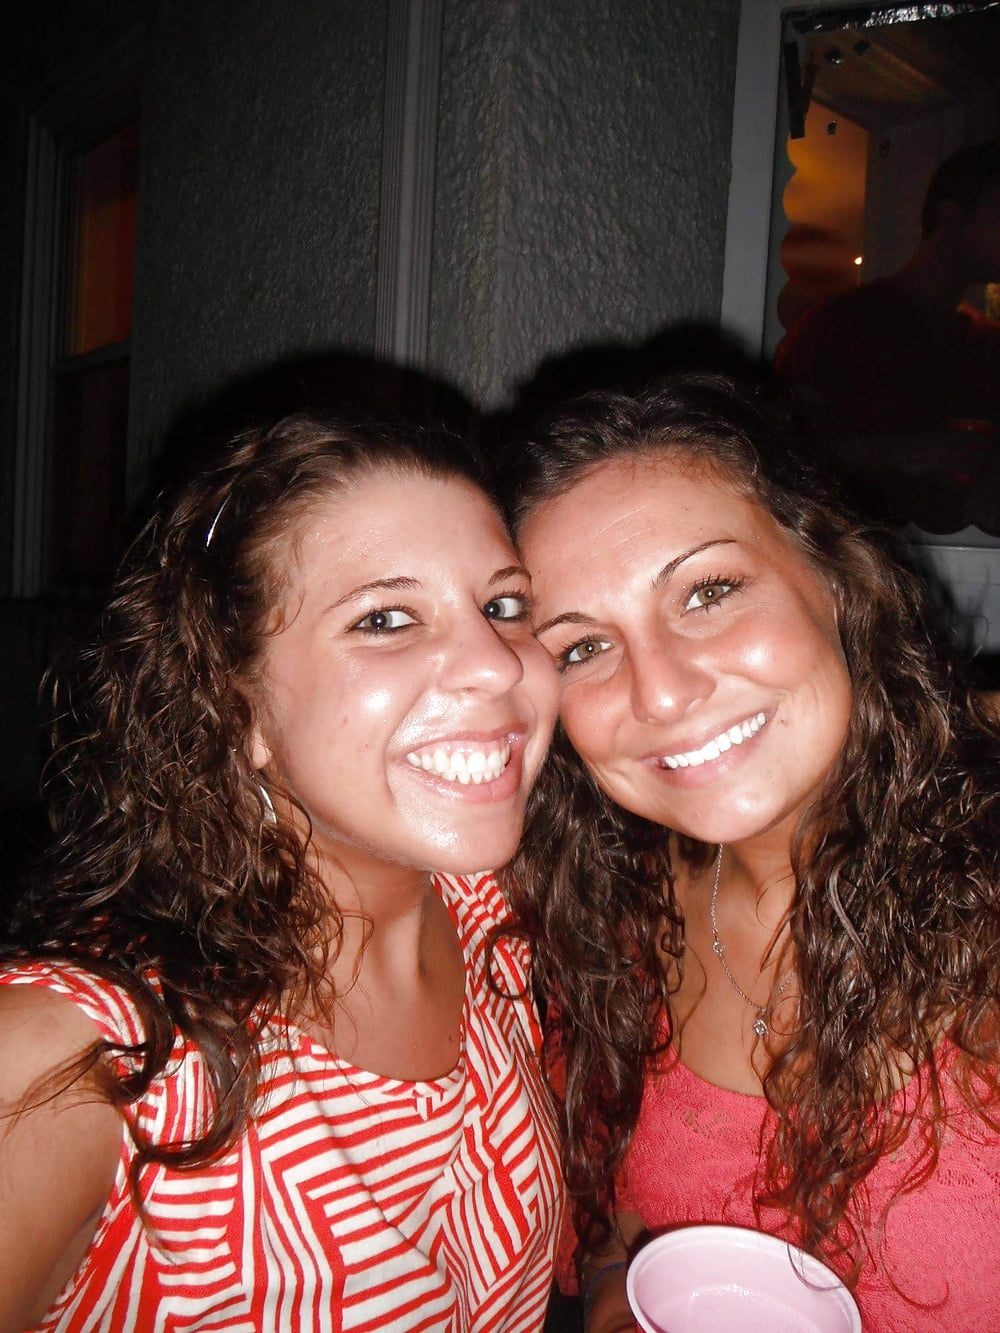 Cute sexy college girls